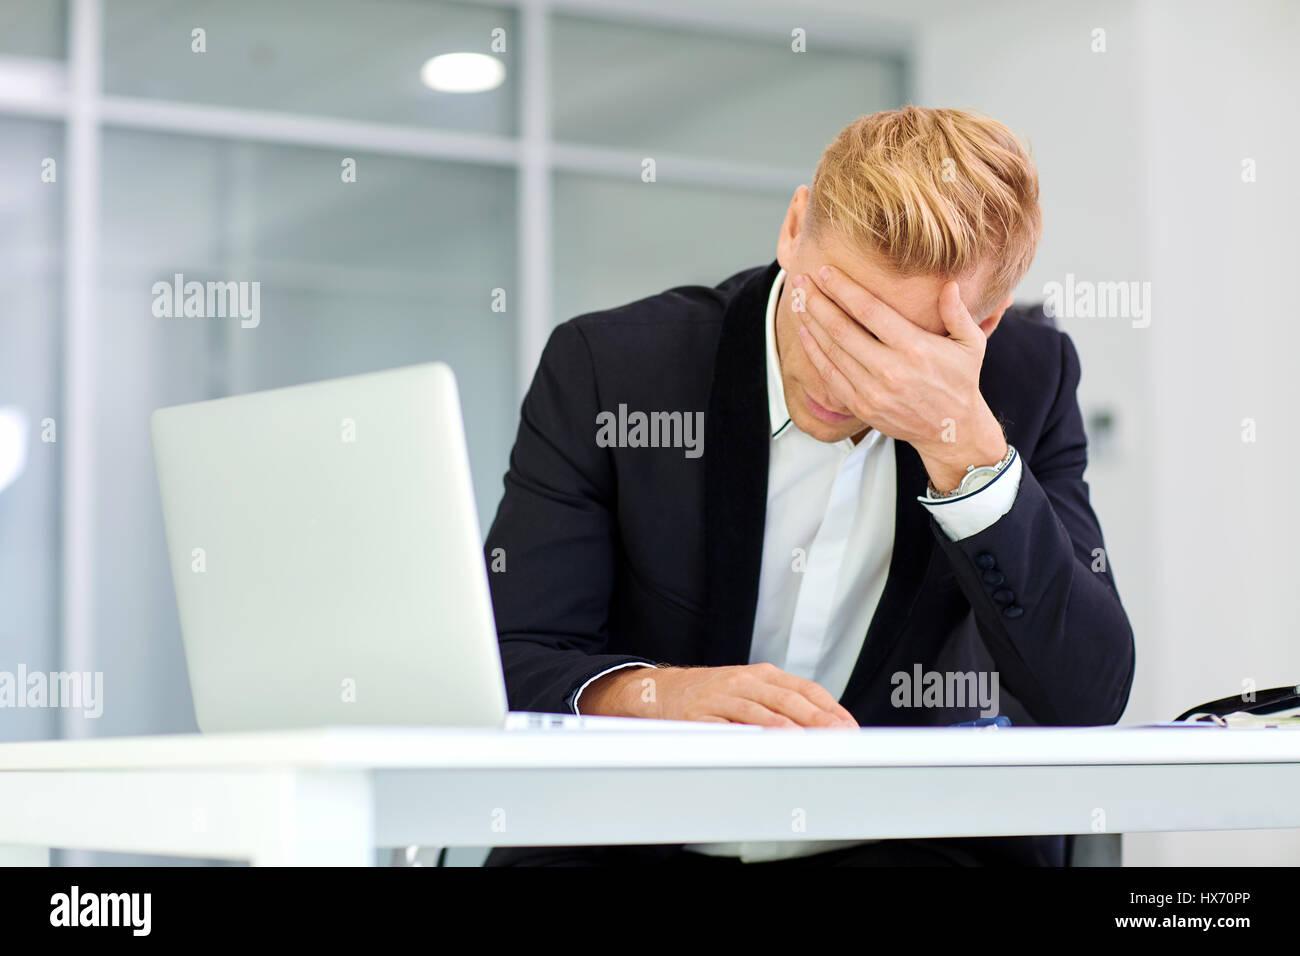 The concept stress crisis depression failure in business. Busine - Stock Image